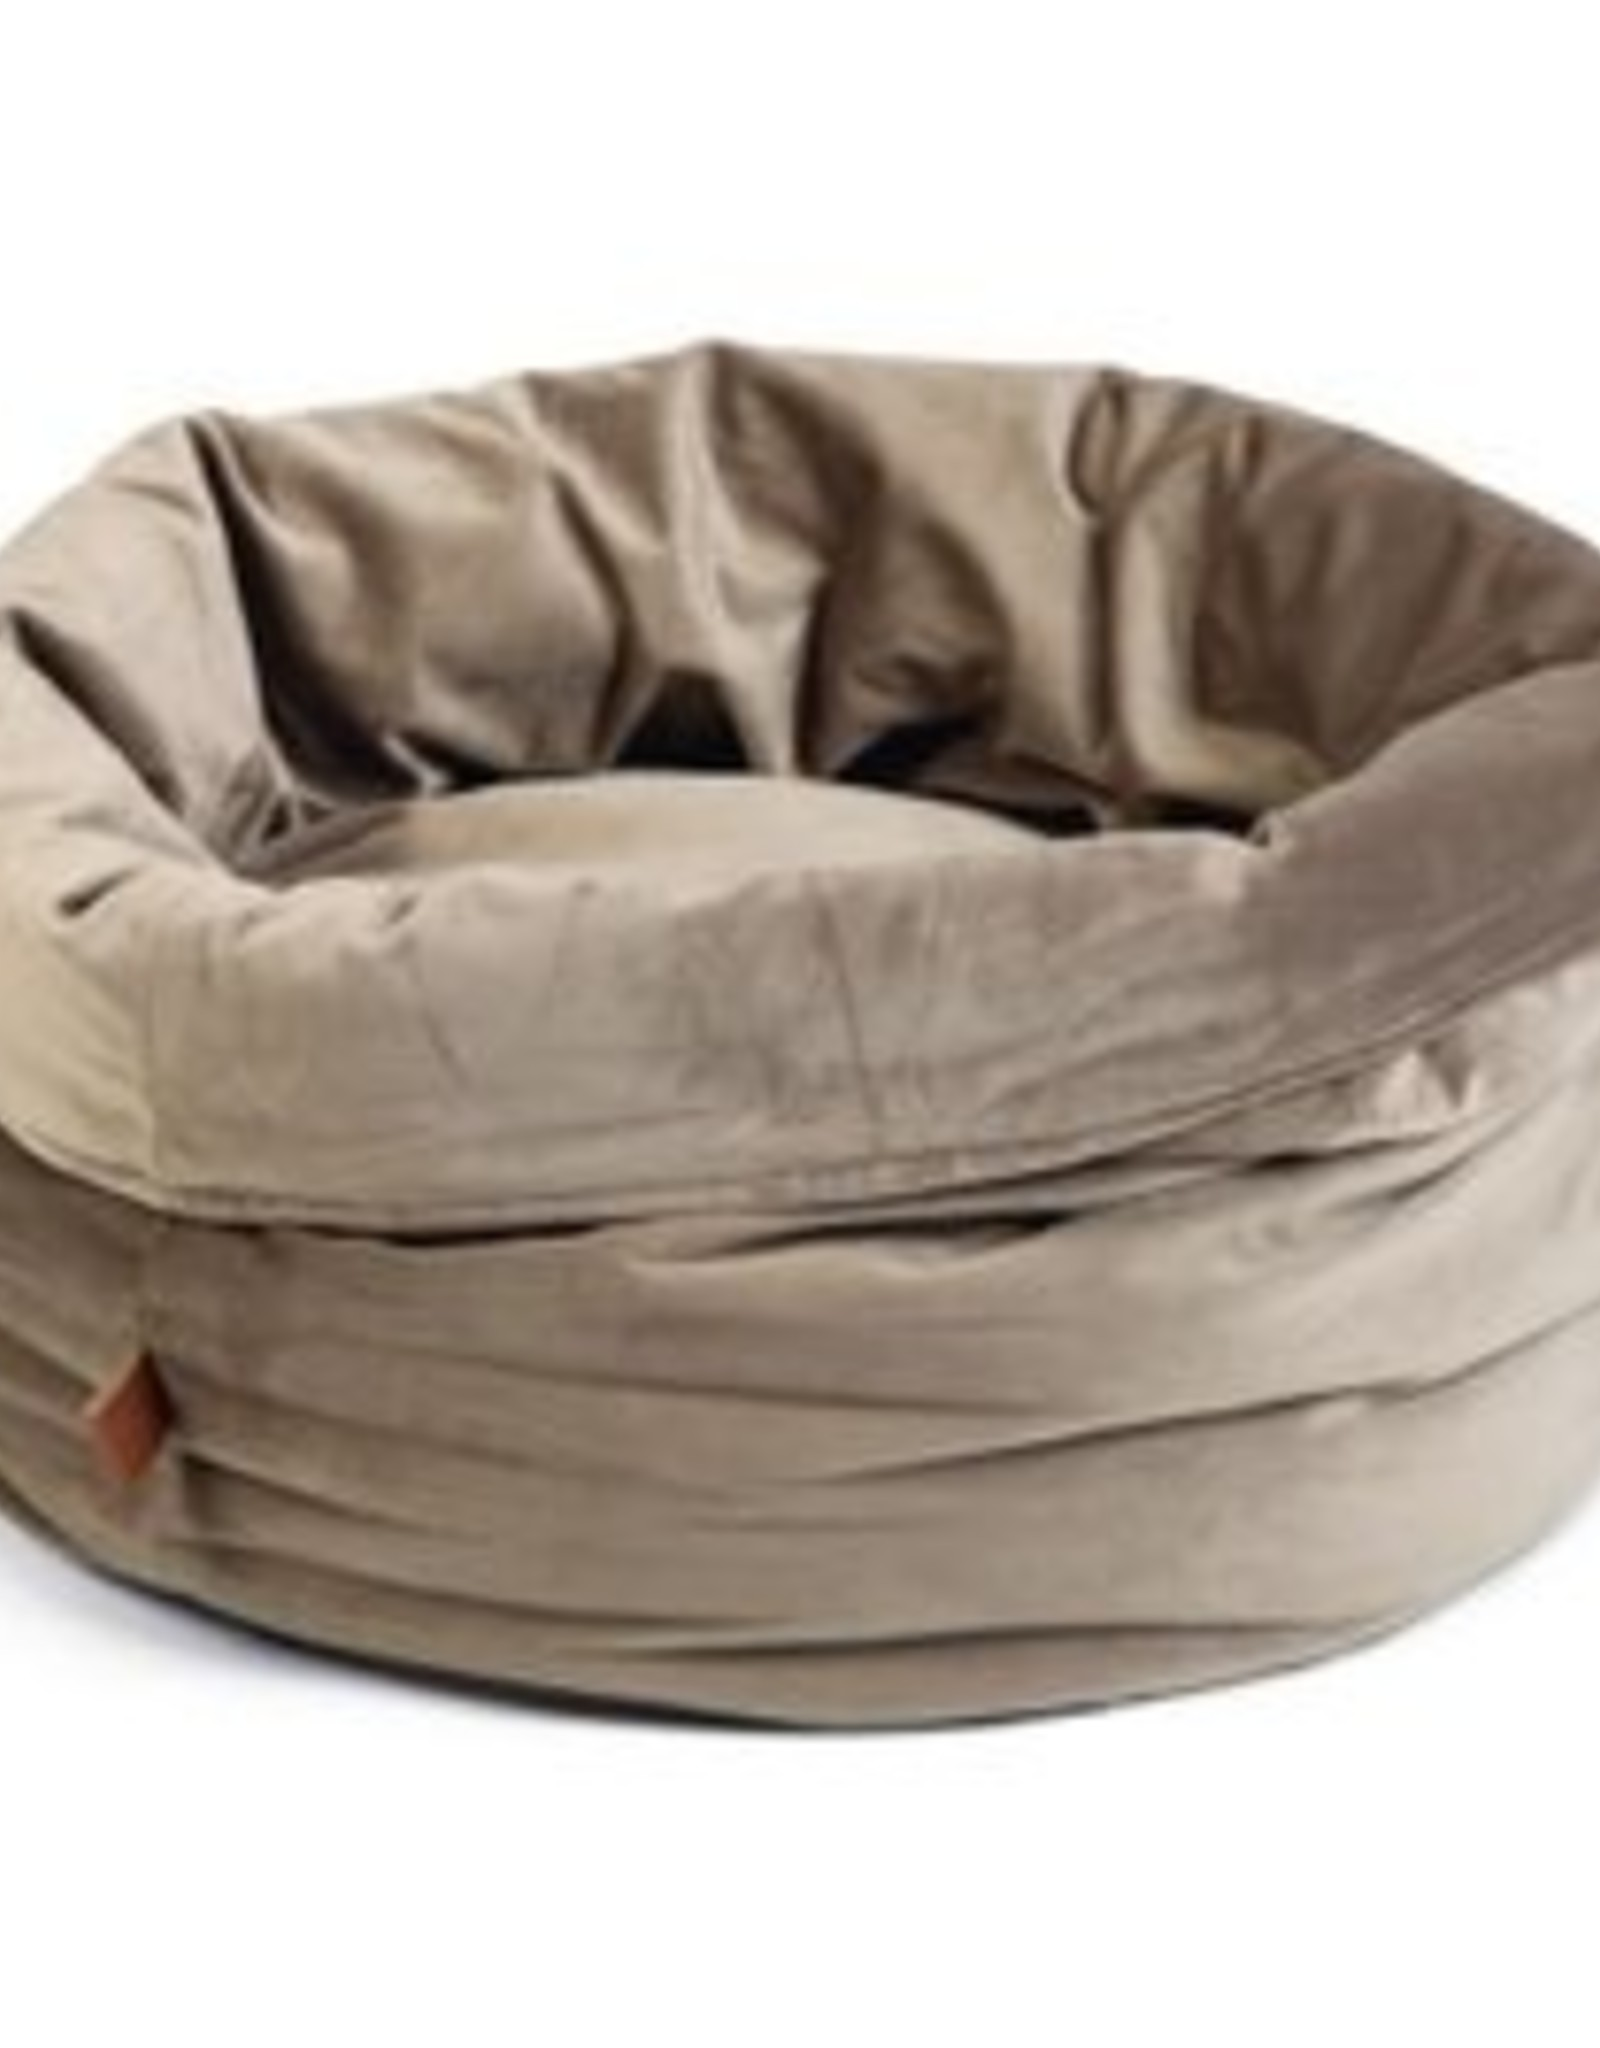 Designed by Lotte Designed by Lotte - fluwelen mand grijs